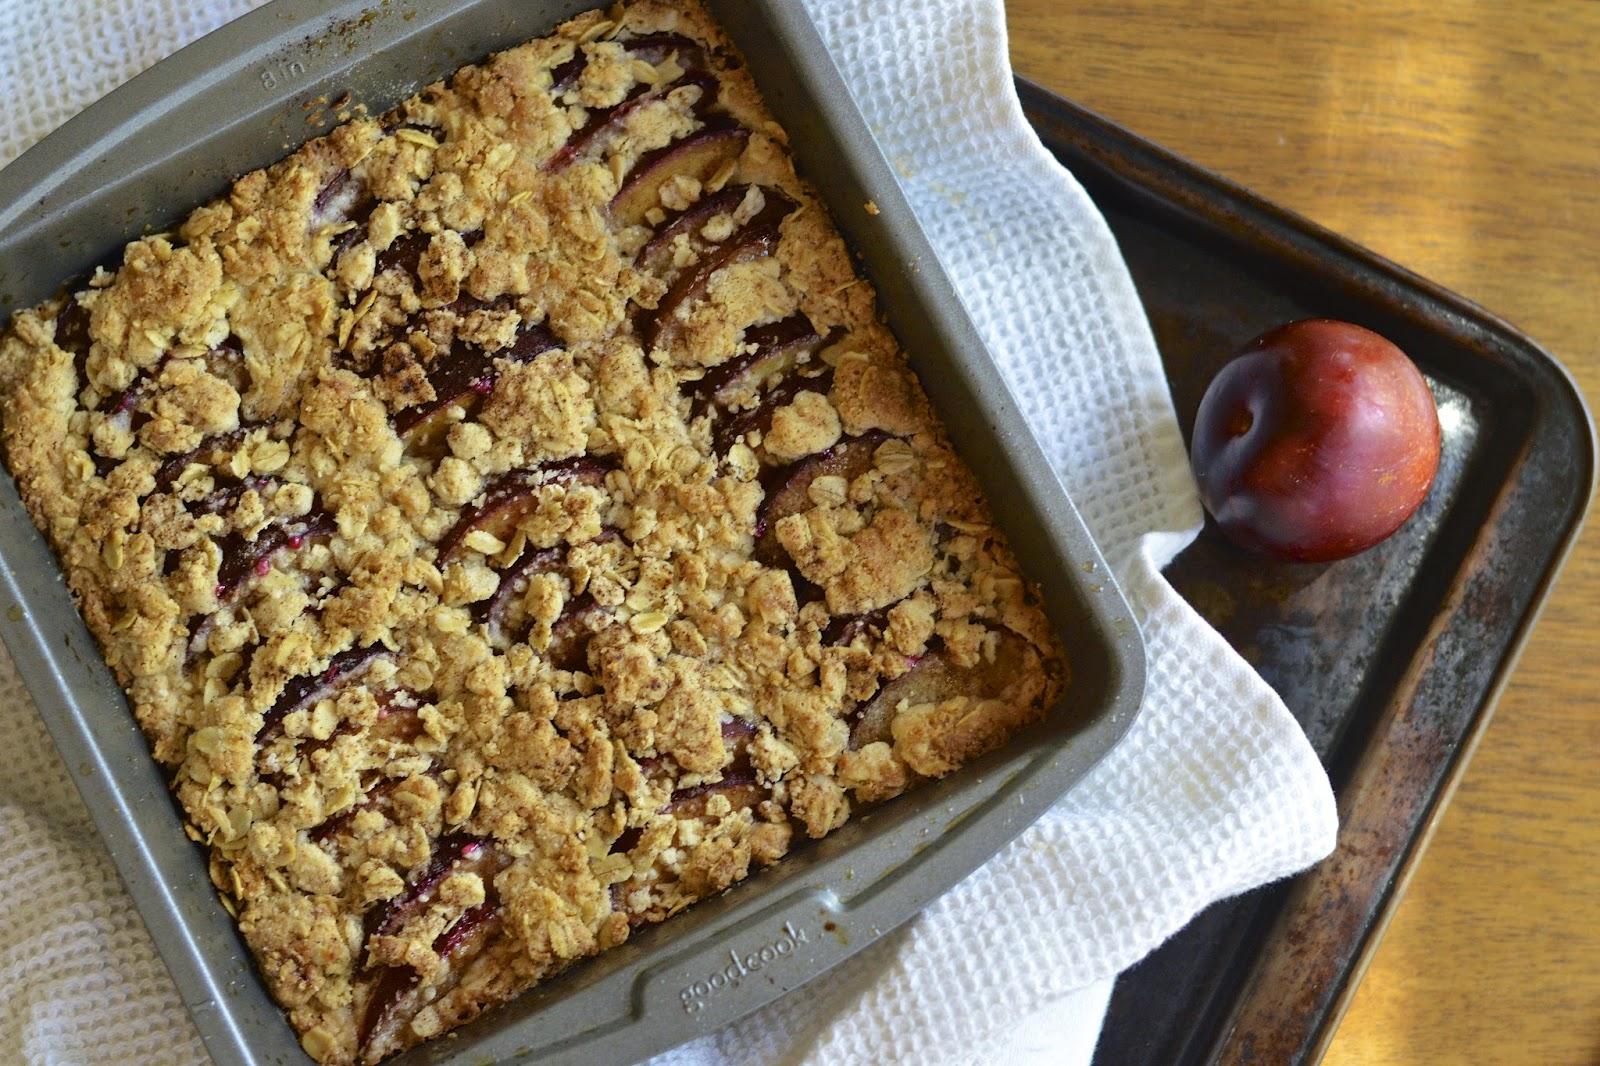 Gluten Free Oatmeal Plum Bars